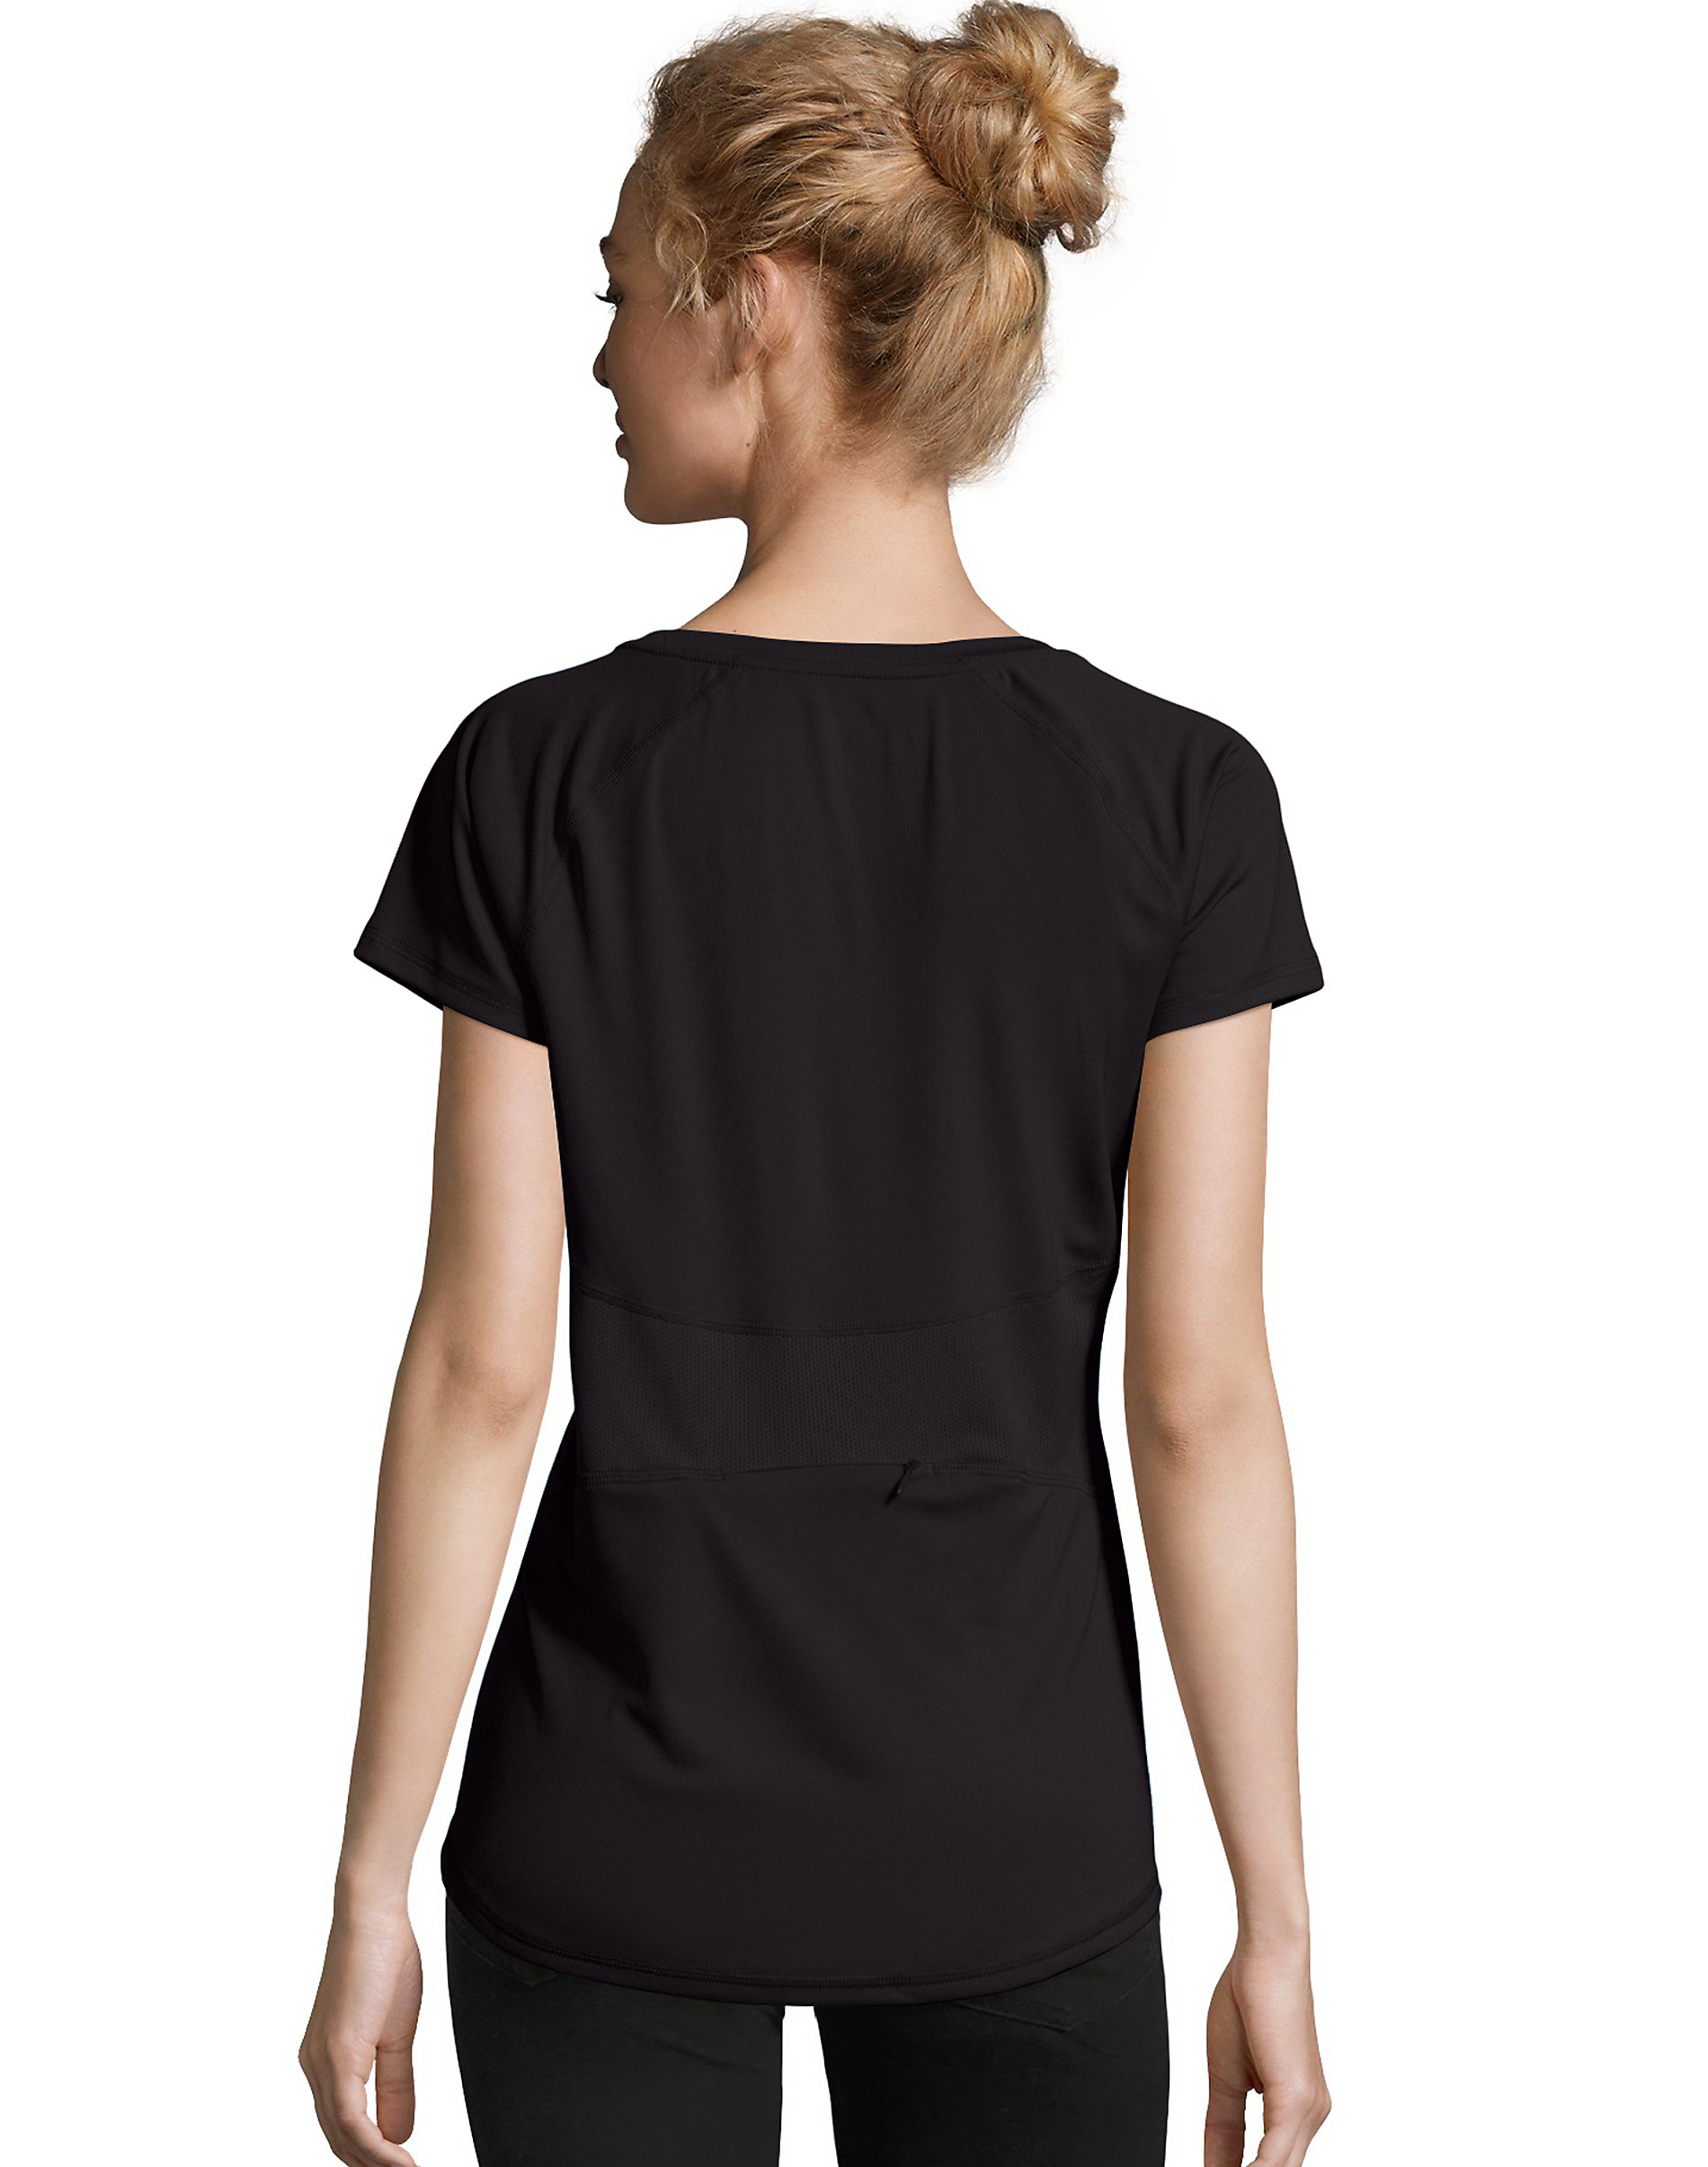 Hanes-Women-039-s-Tee-Shirt-Mesh-Insets-Performance-Sport-Cool-DRI-Comfort-Pocket thumbnail 3